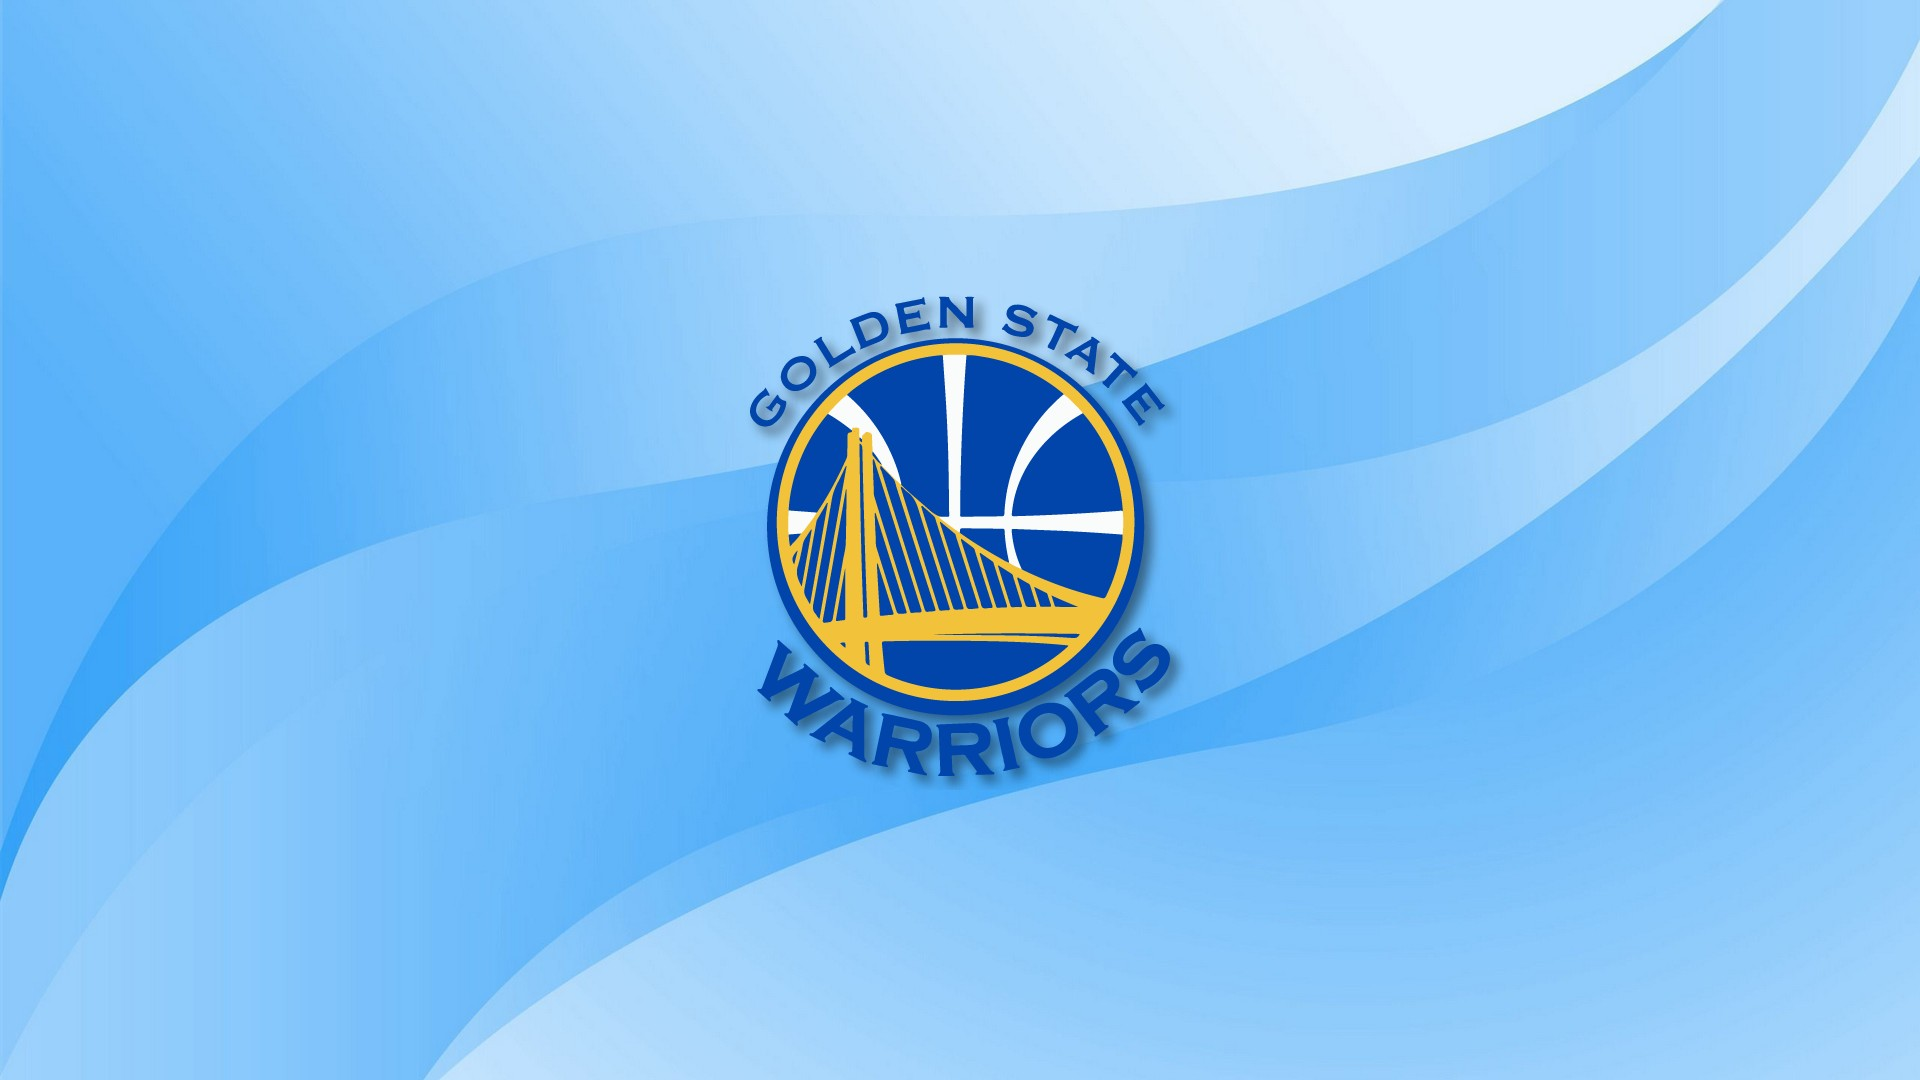 Golden State Warriors Logo For Desktop Wallpaper 2019 Basketball 1920x1080